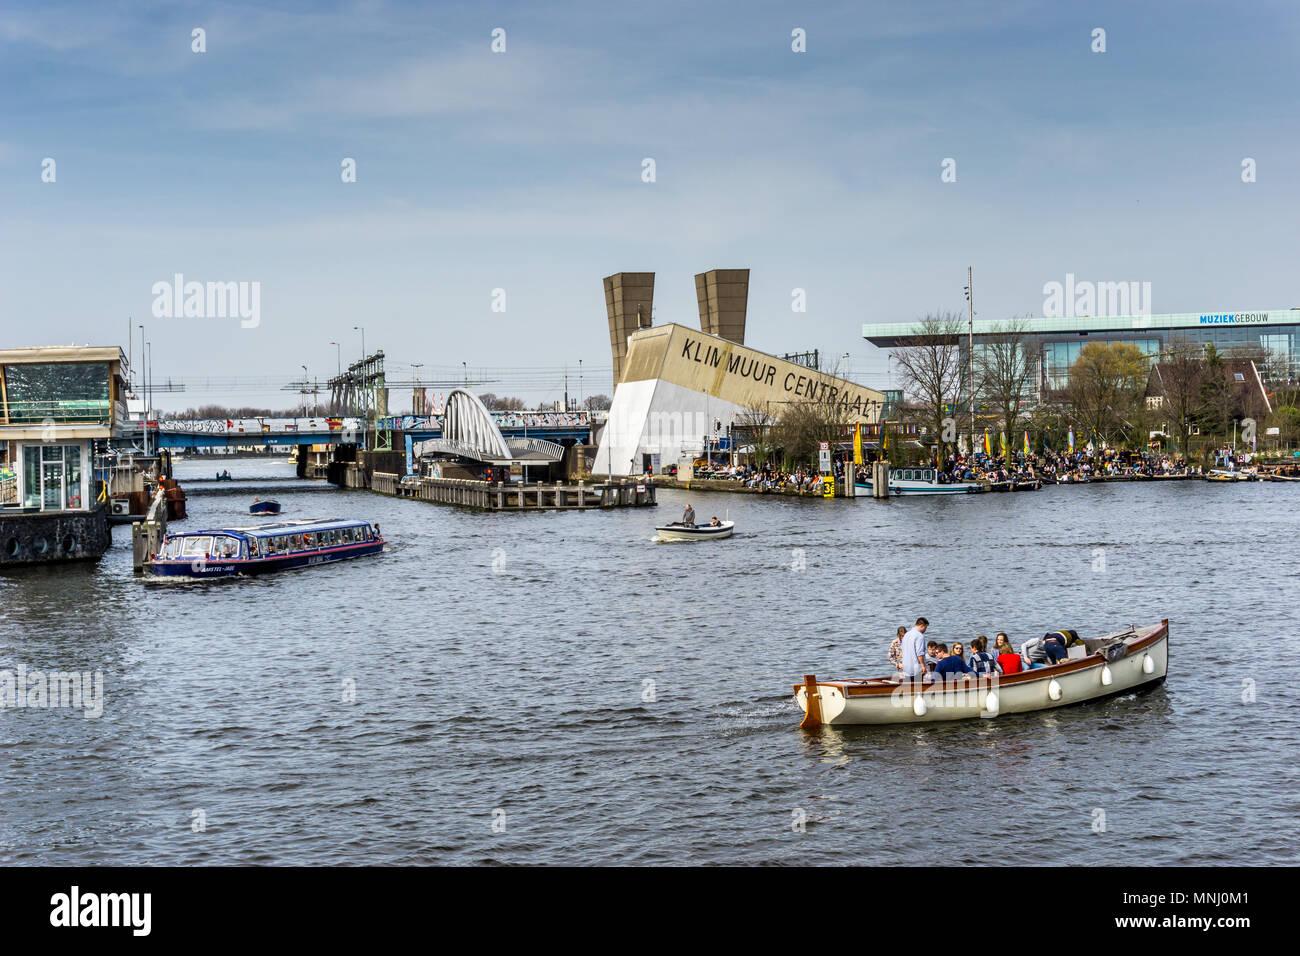 River Ij, Amsterdam, Netherlands, Europe. - Stock Image